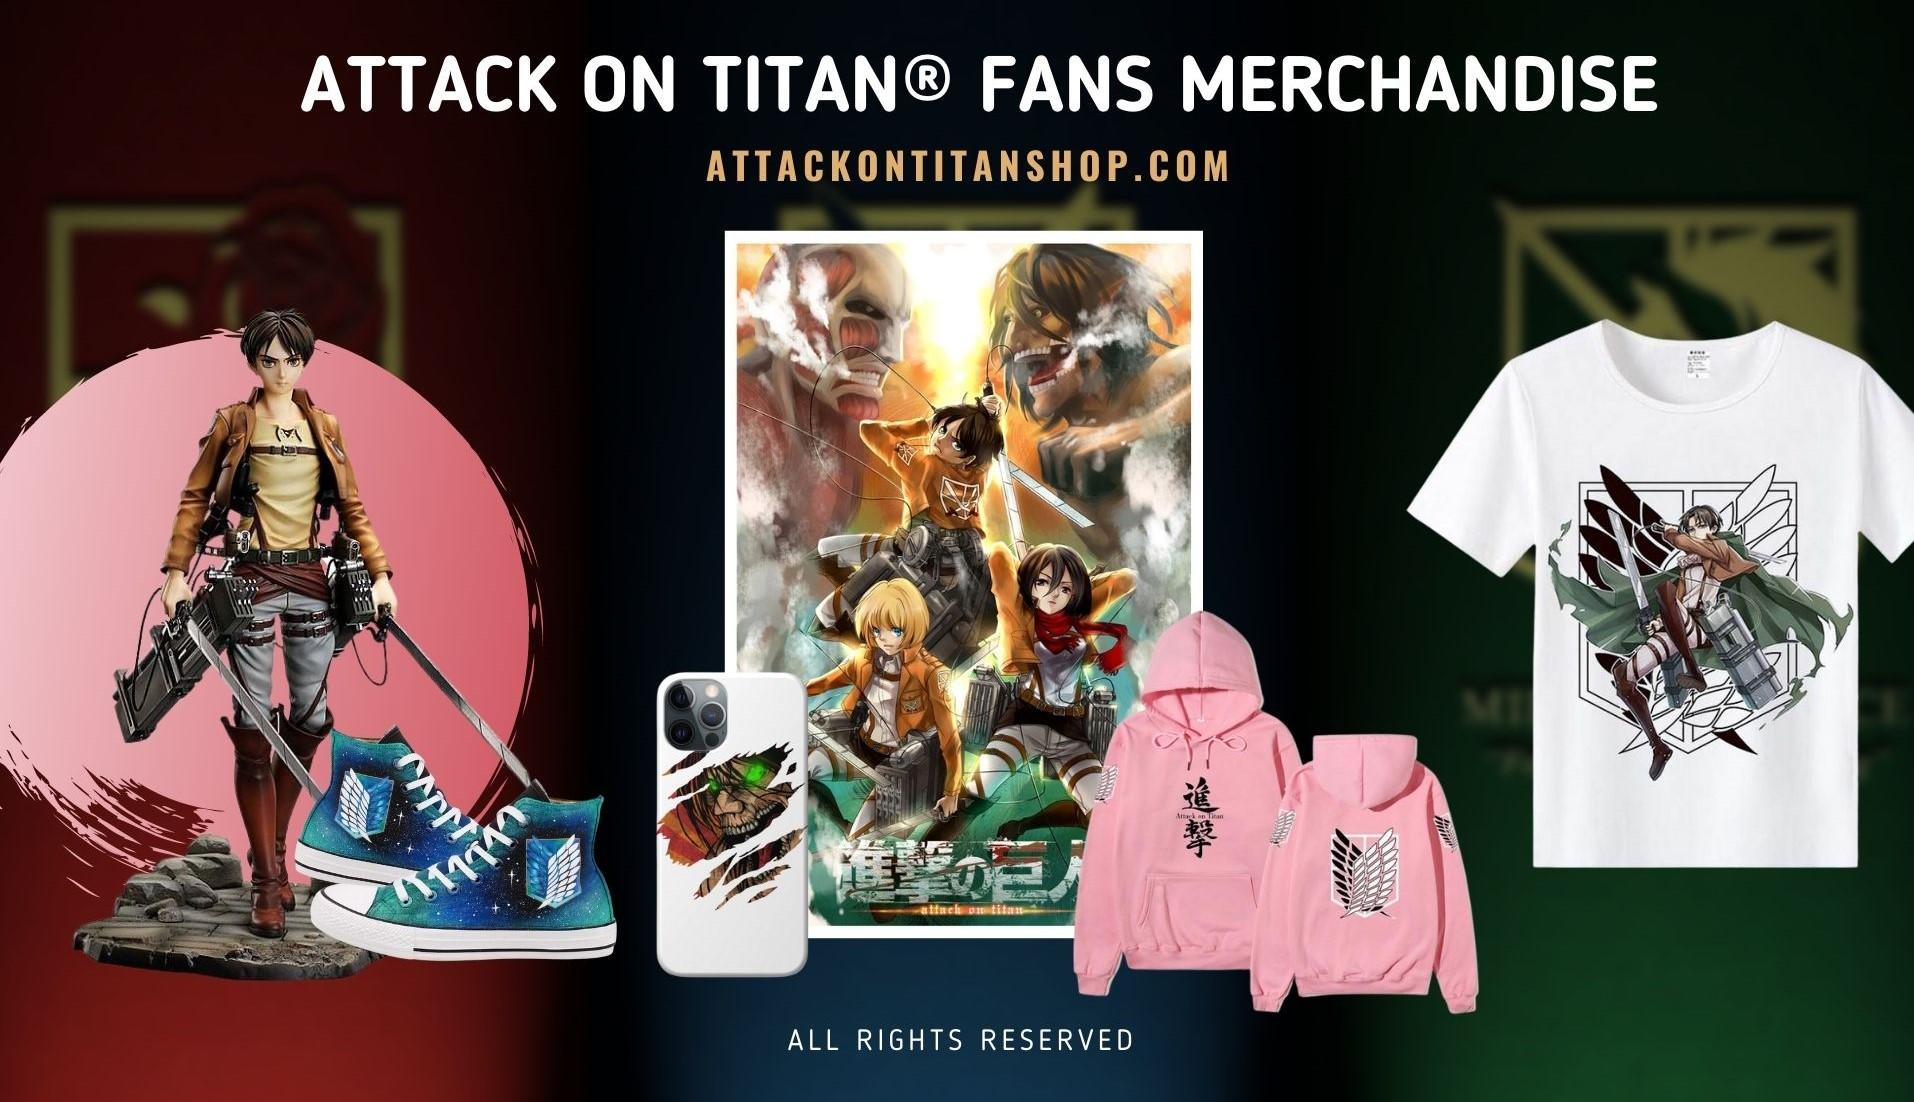 Attack On titan Merch Web Banner 2 - Attack On Titan Shop